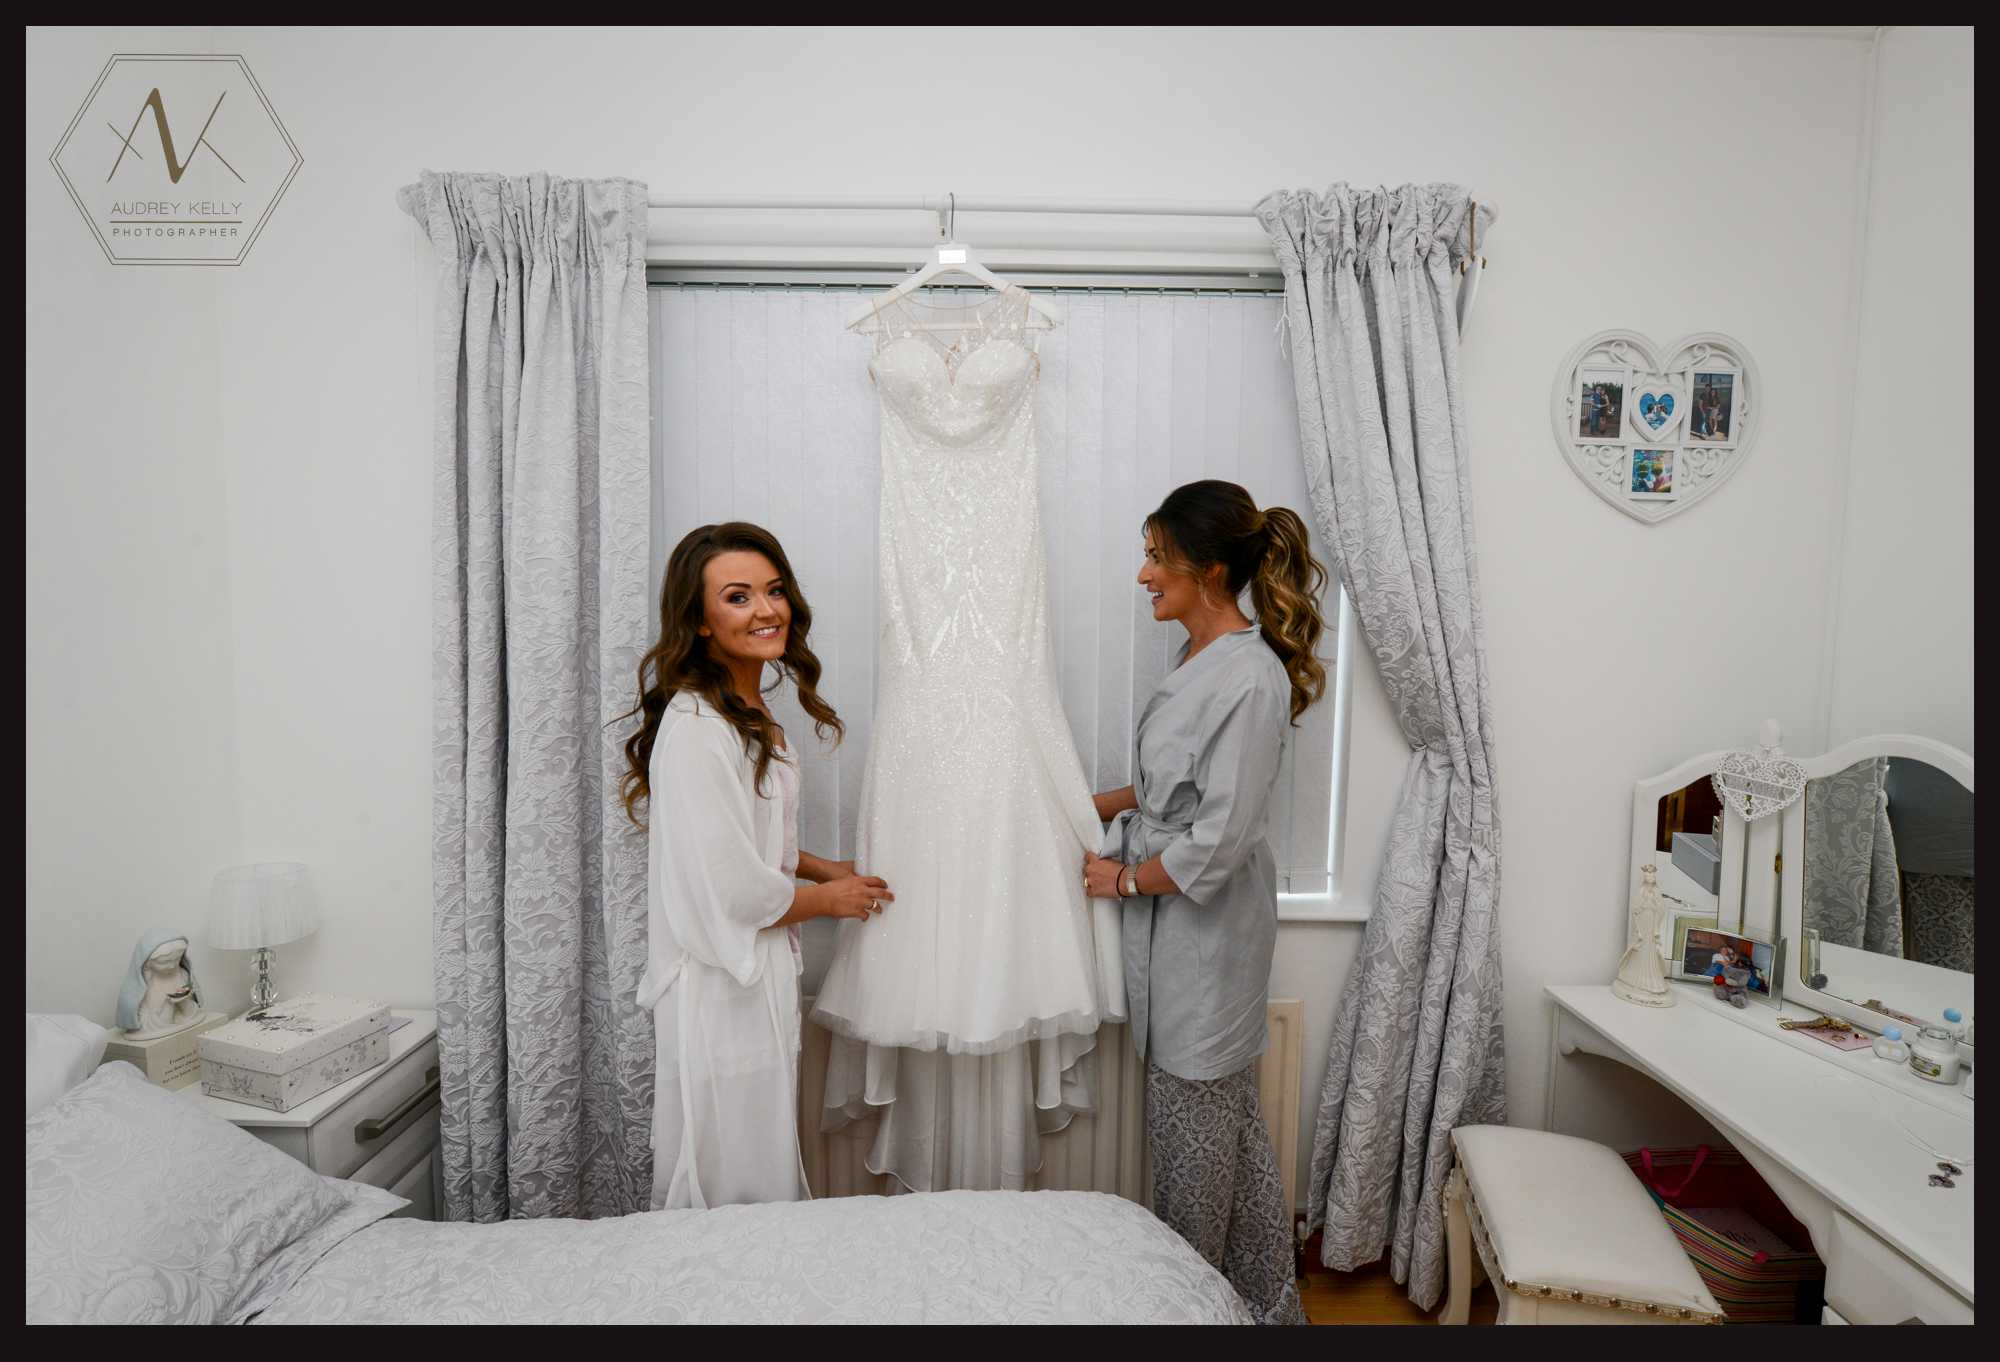 blathnaid_lee_wedding_day_images_omagh_bridal_dress_cararose_wedding_gown_2.jpg